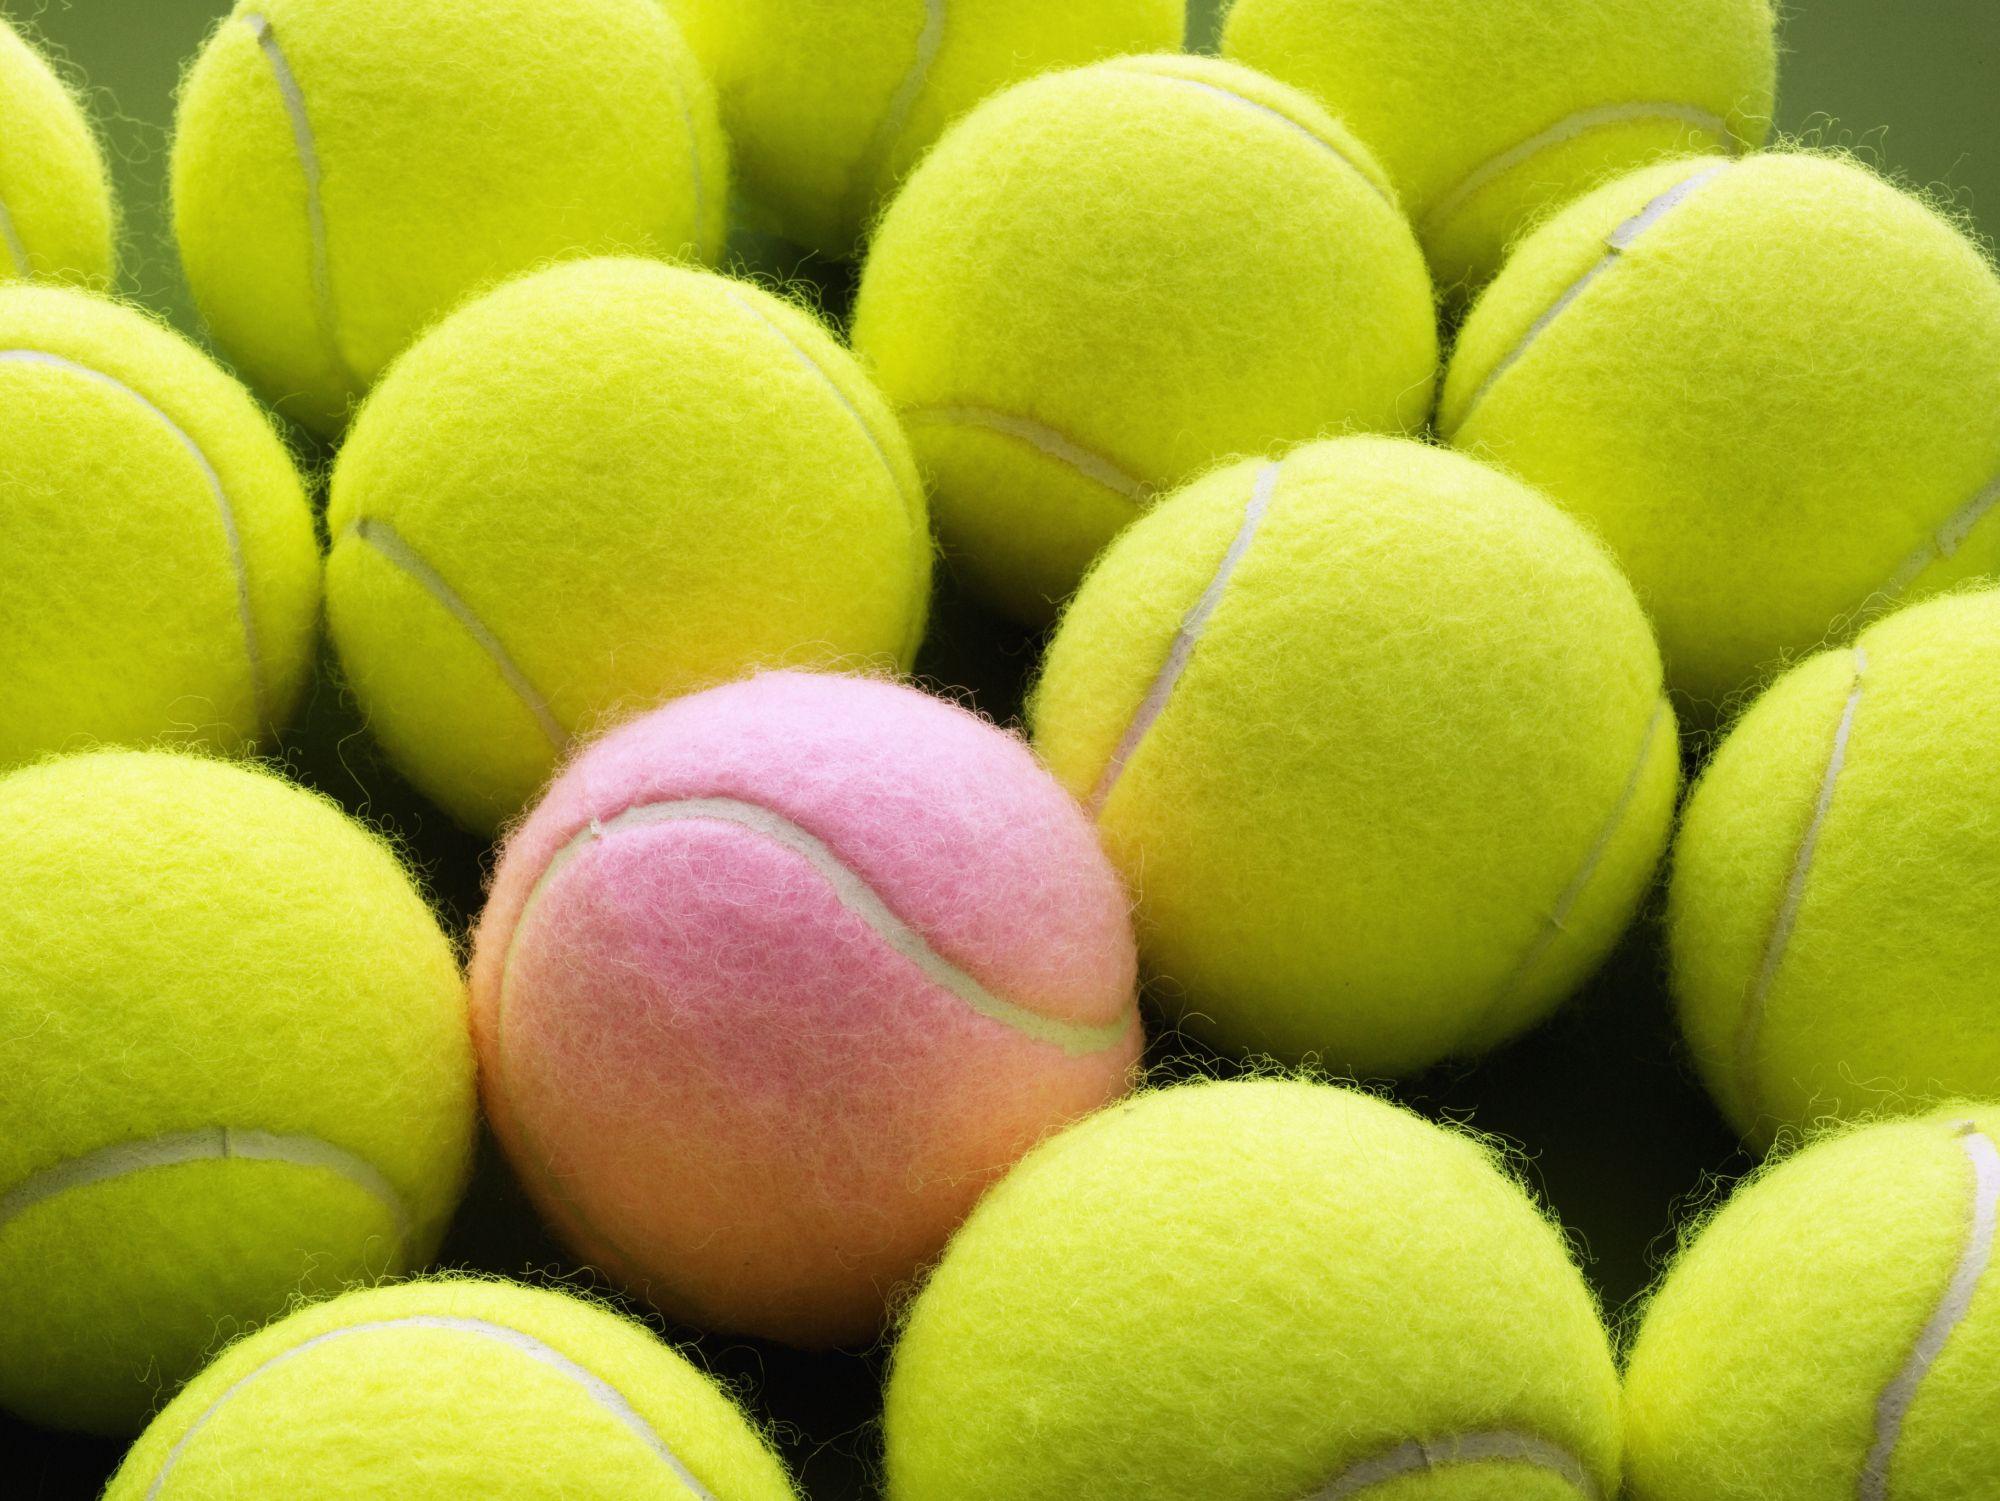 I Love This Tennis Ball Iphone Lock Screen Home Screen Background Screen Screen Background In 2020 Tennis Wallpaper Tennis Tennis Ball